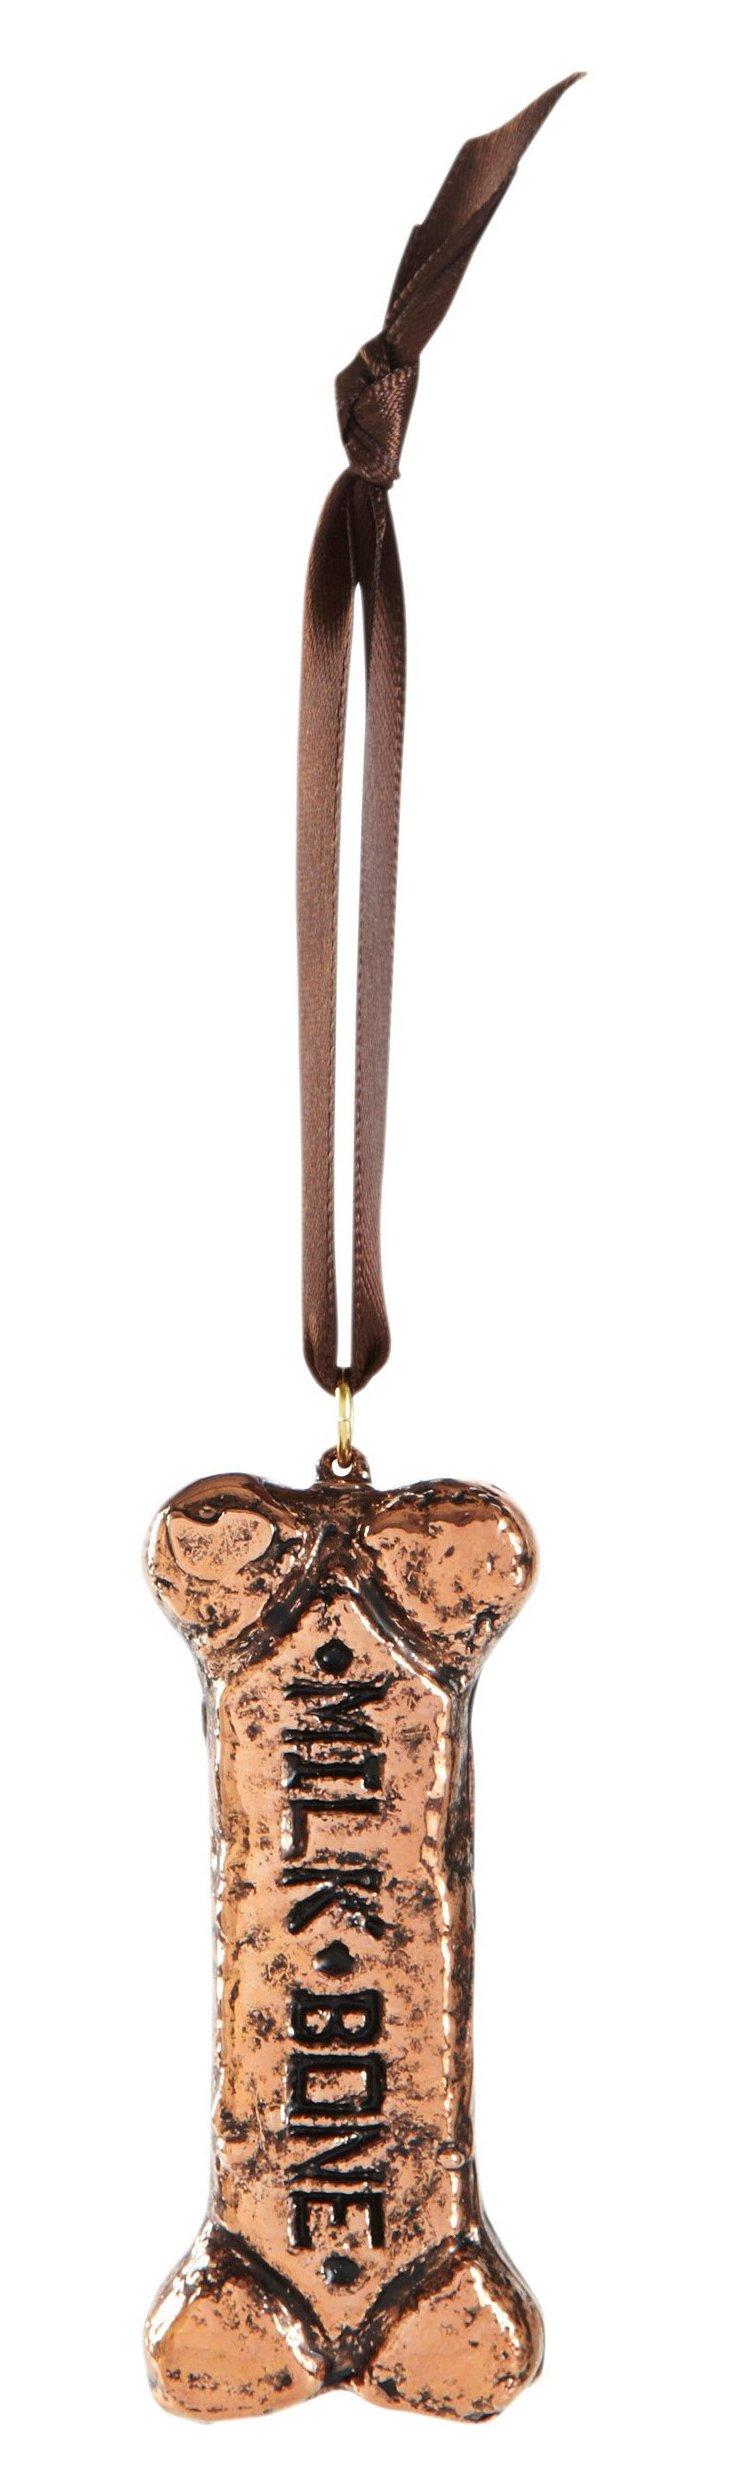 "3"" Dog Biscuit Ornament, Copper"